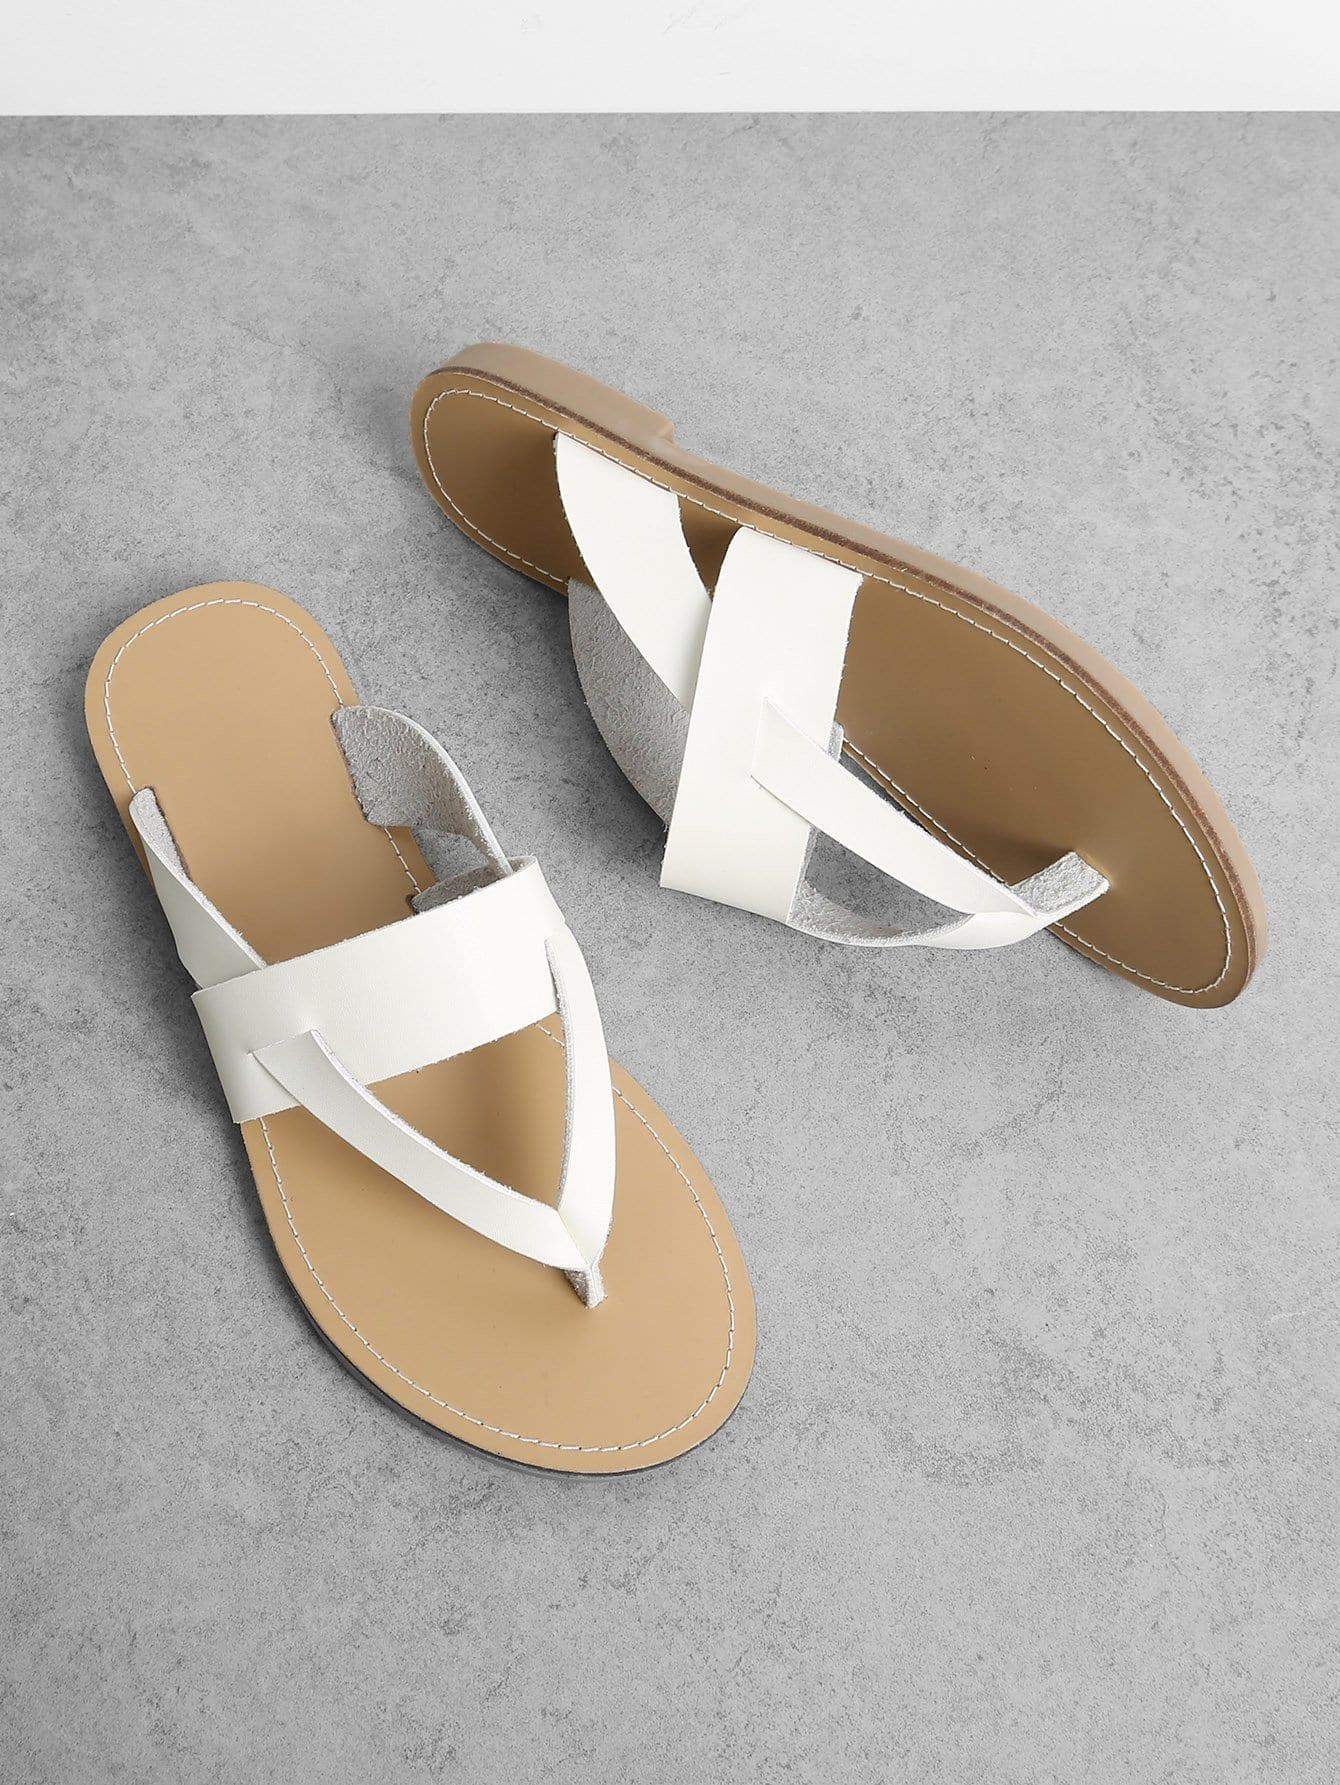 все цены на Multi Strap Gladiator Toe Post Sandals